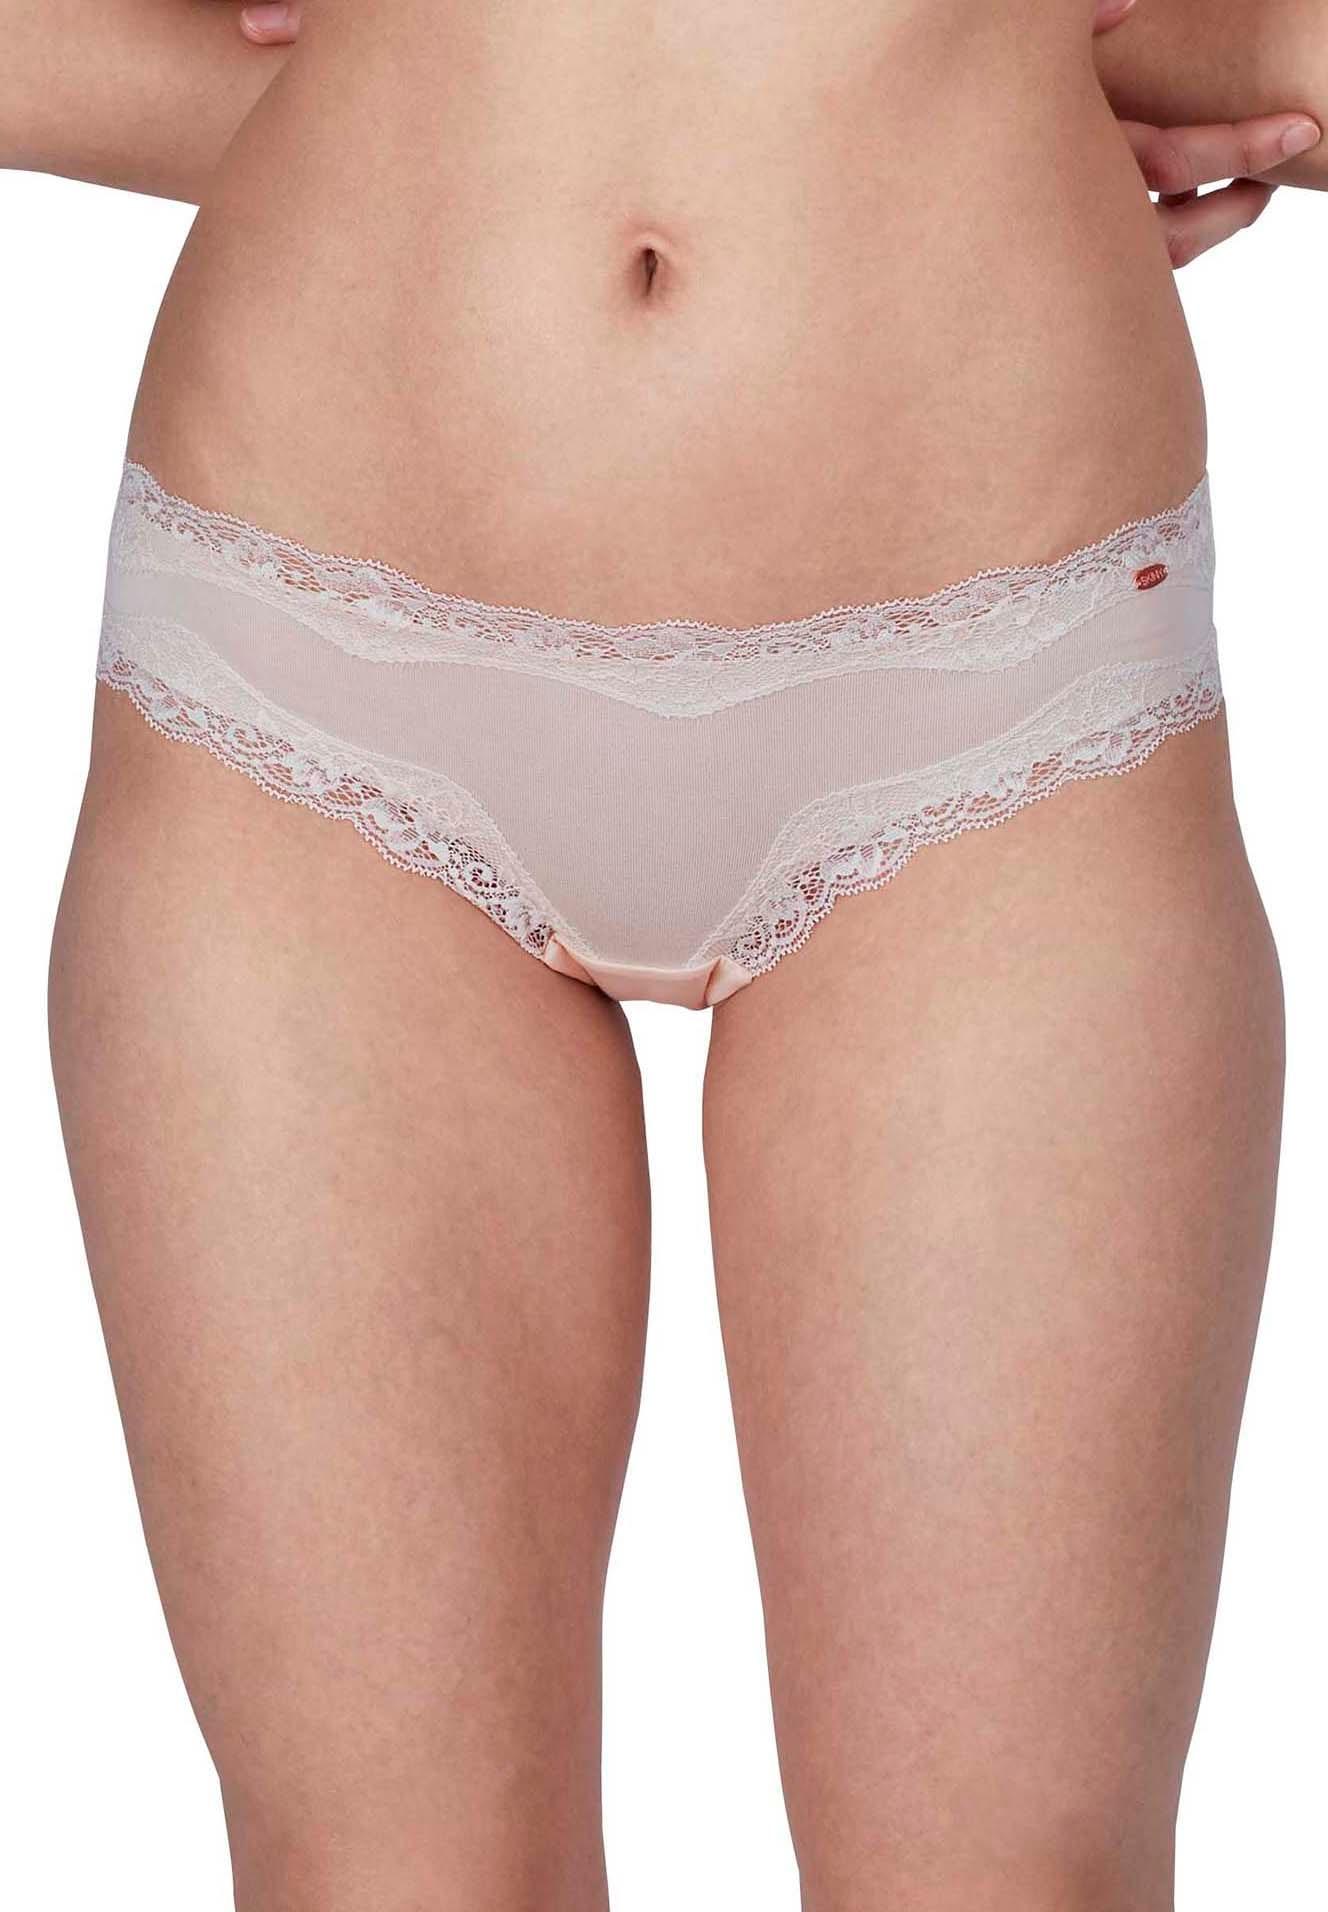 Skiny Skiny Damen Rio Slip Bella mit Spitzen-Details